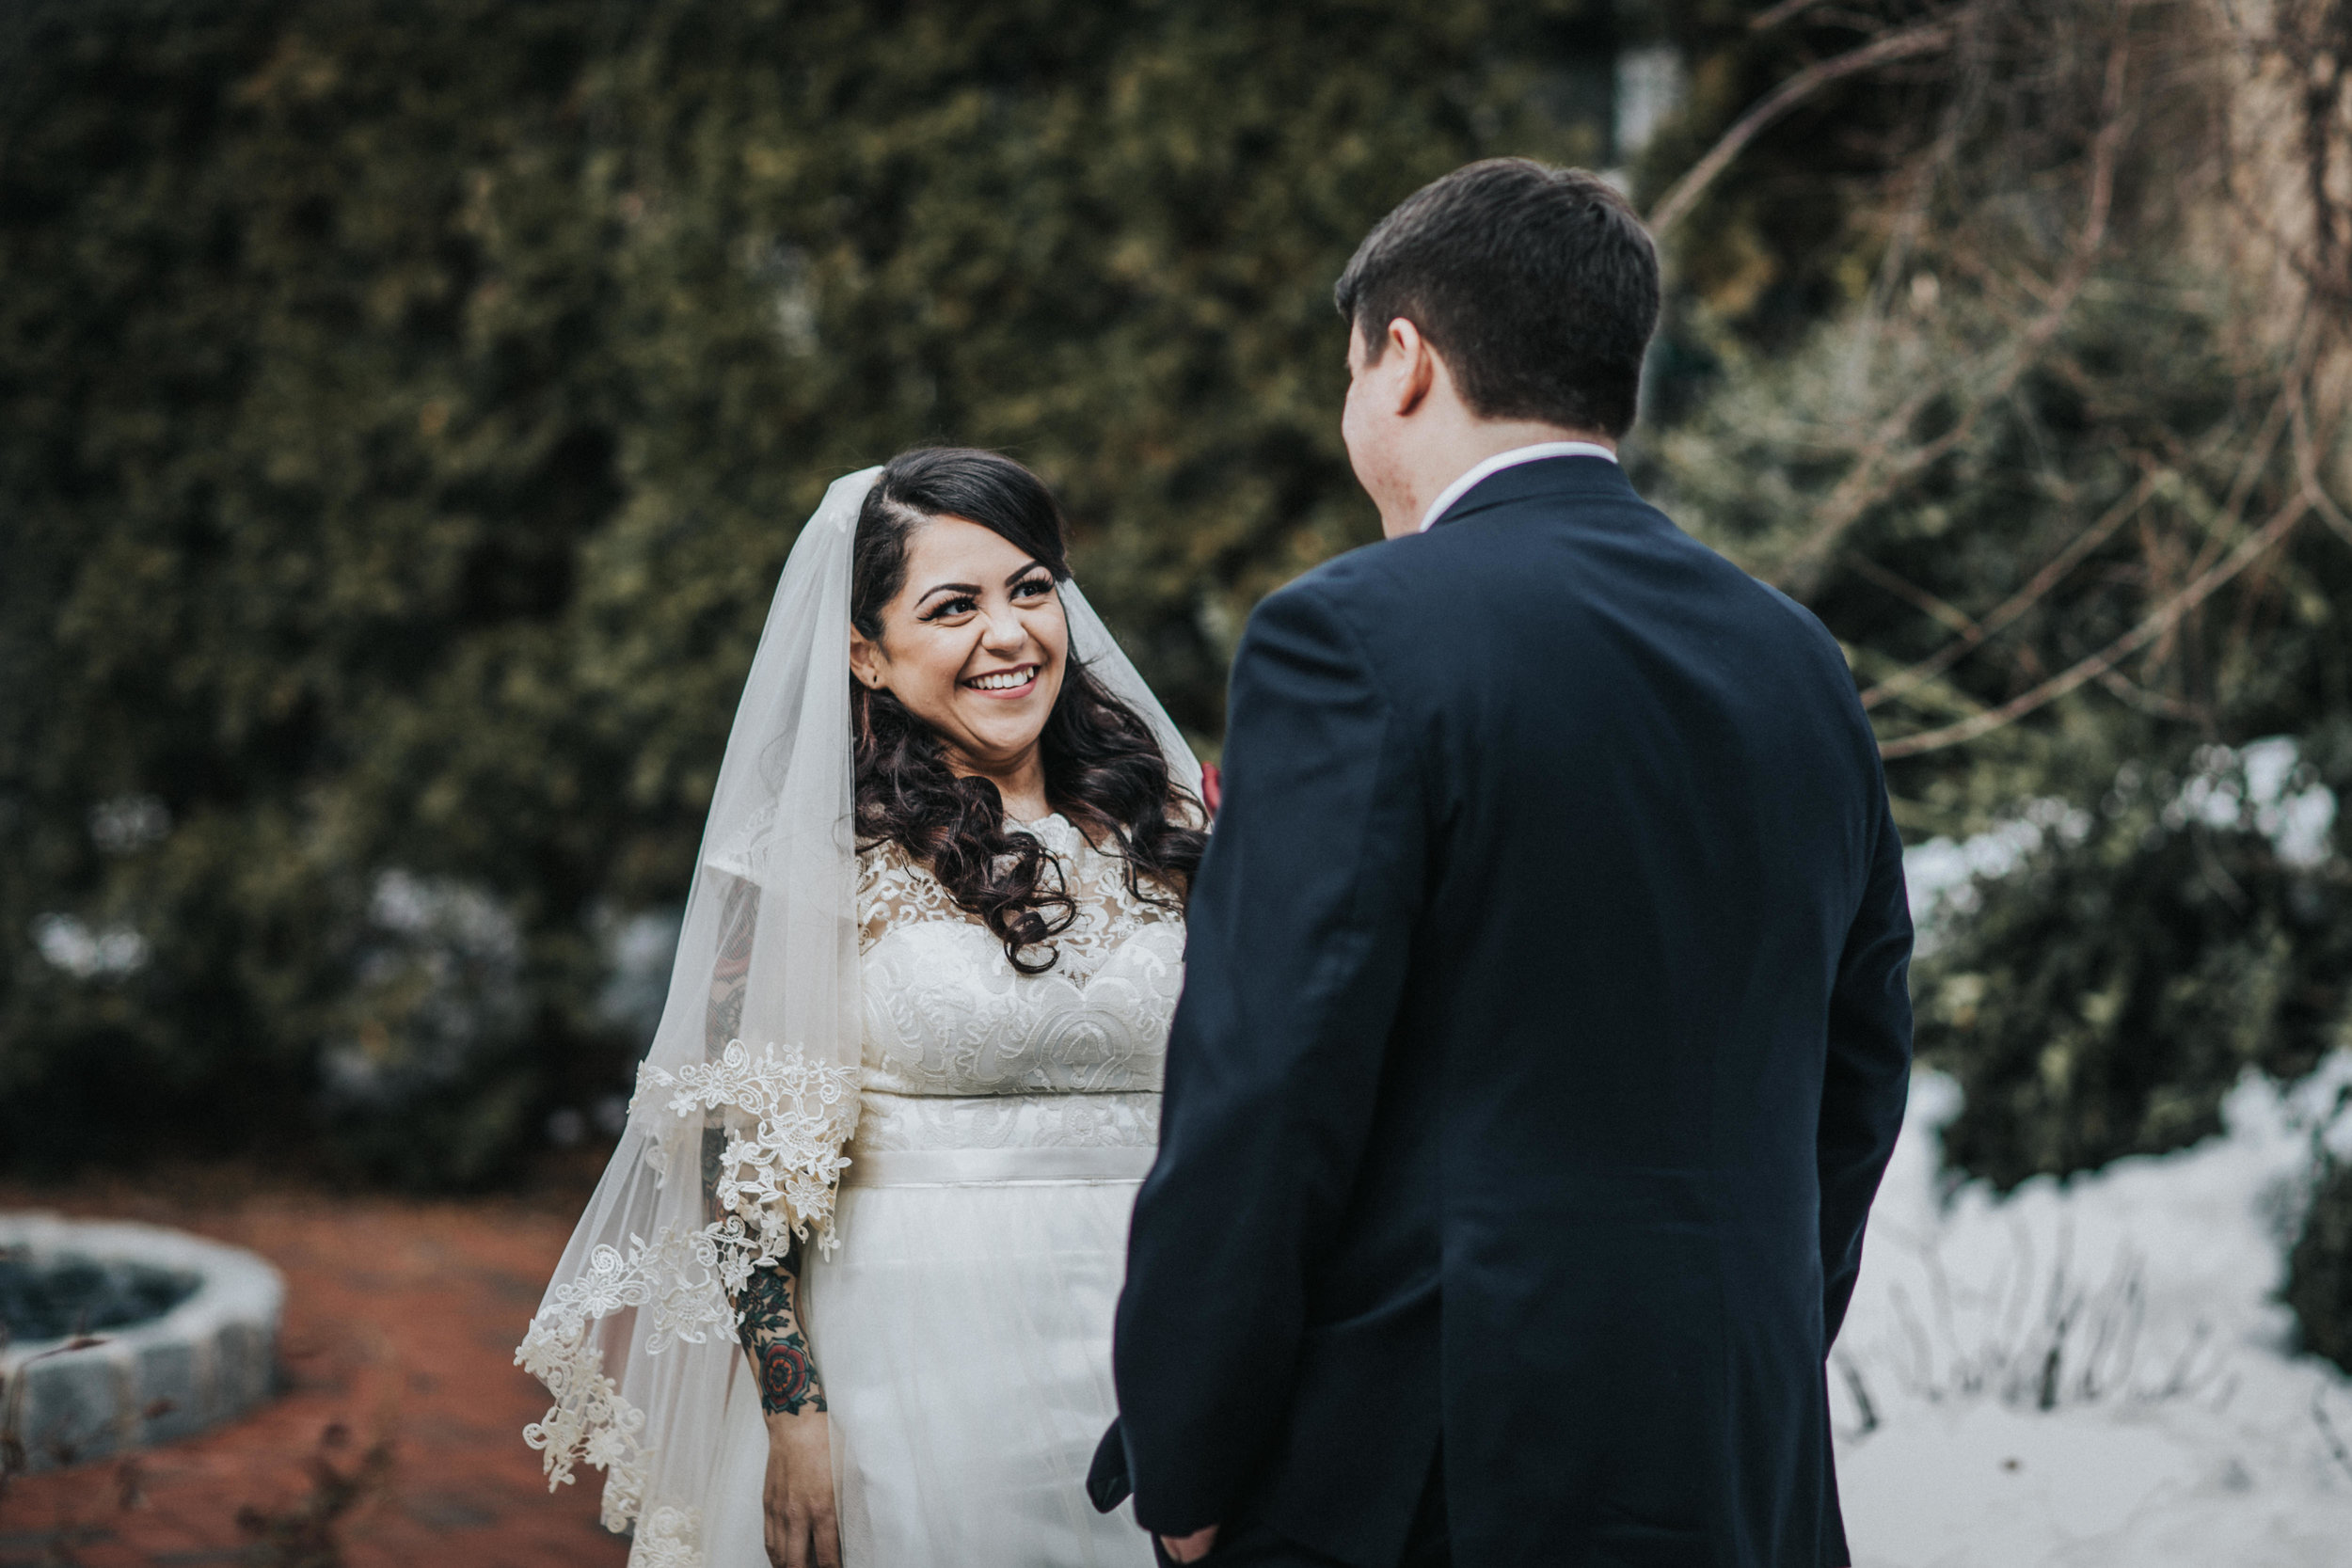 New-Jersey-Wedding-Photographer-ReceptionCenter-Valeria&Mike-First-Look-Bride&Groom (56 of 69).jpg